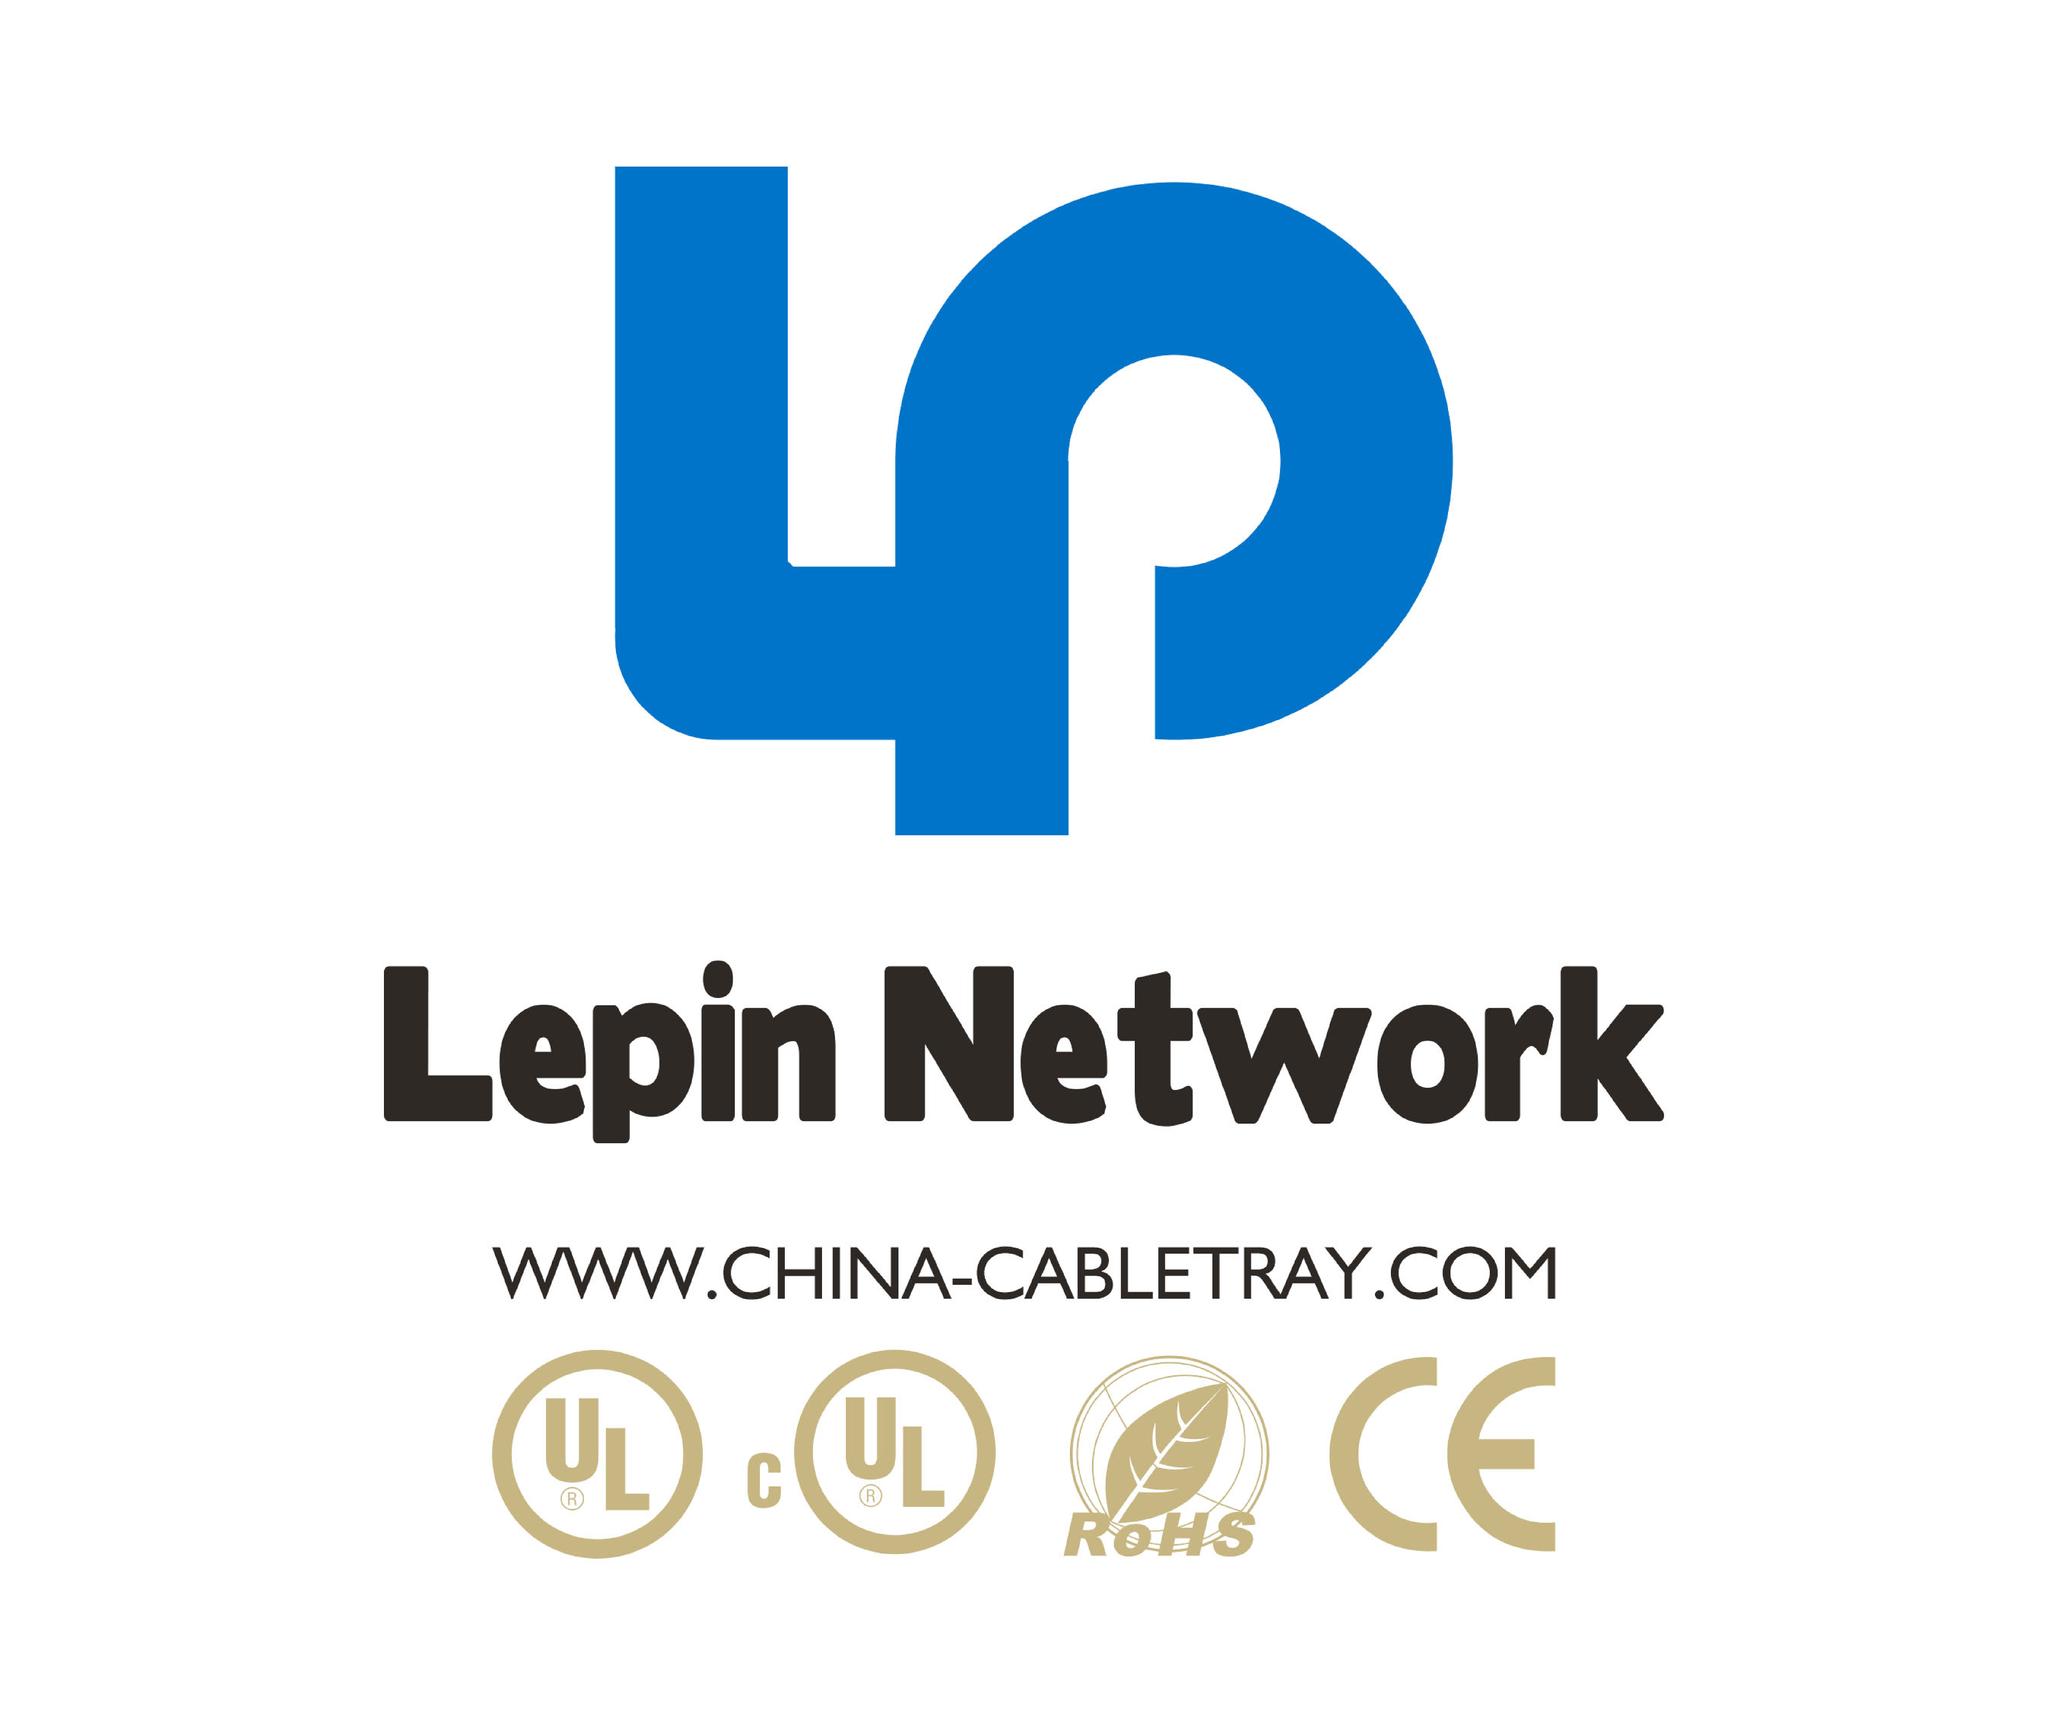 Ningbo Lepin Network Equipment Co.,Ltd